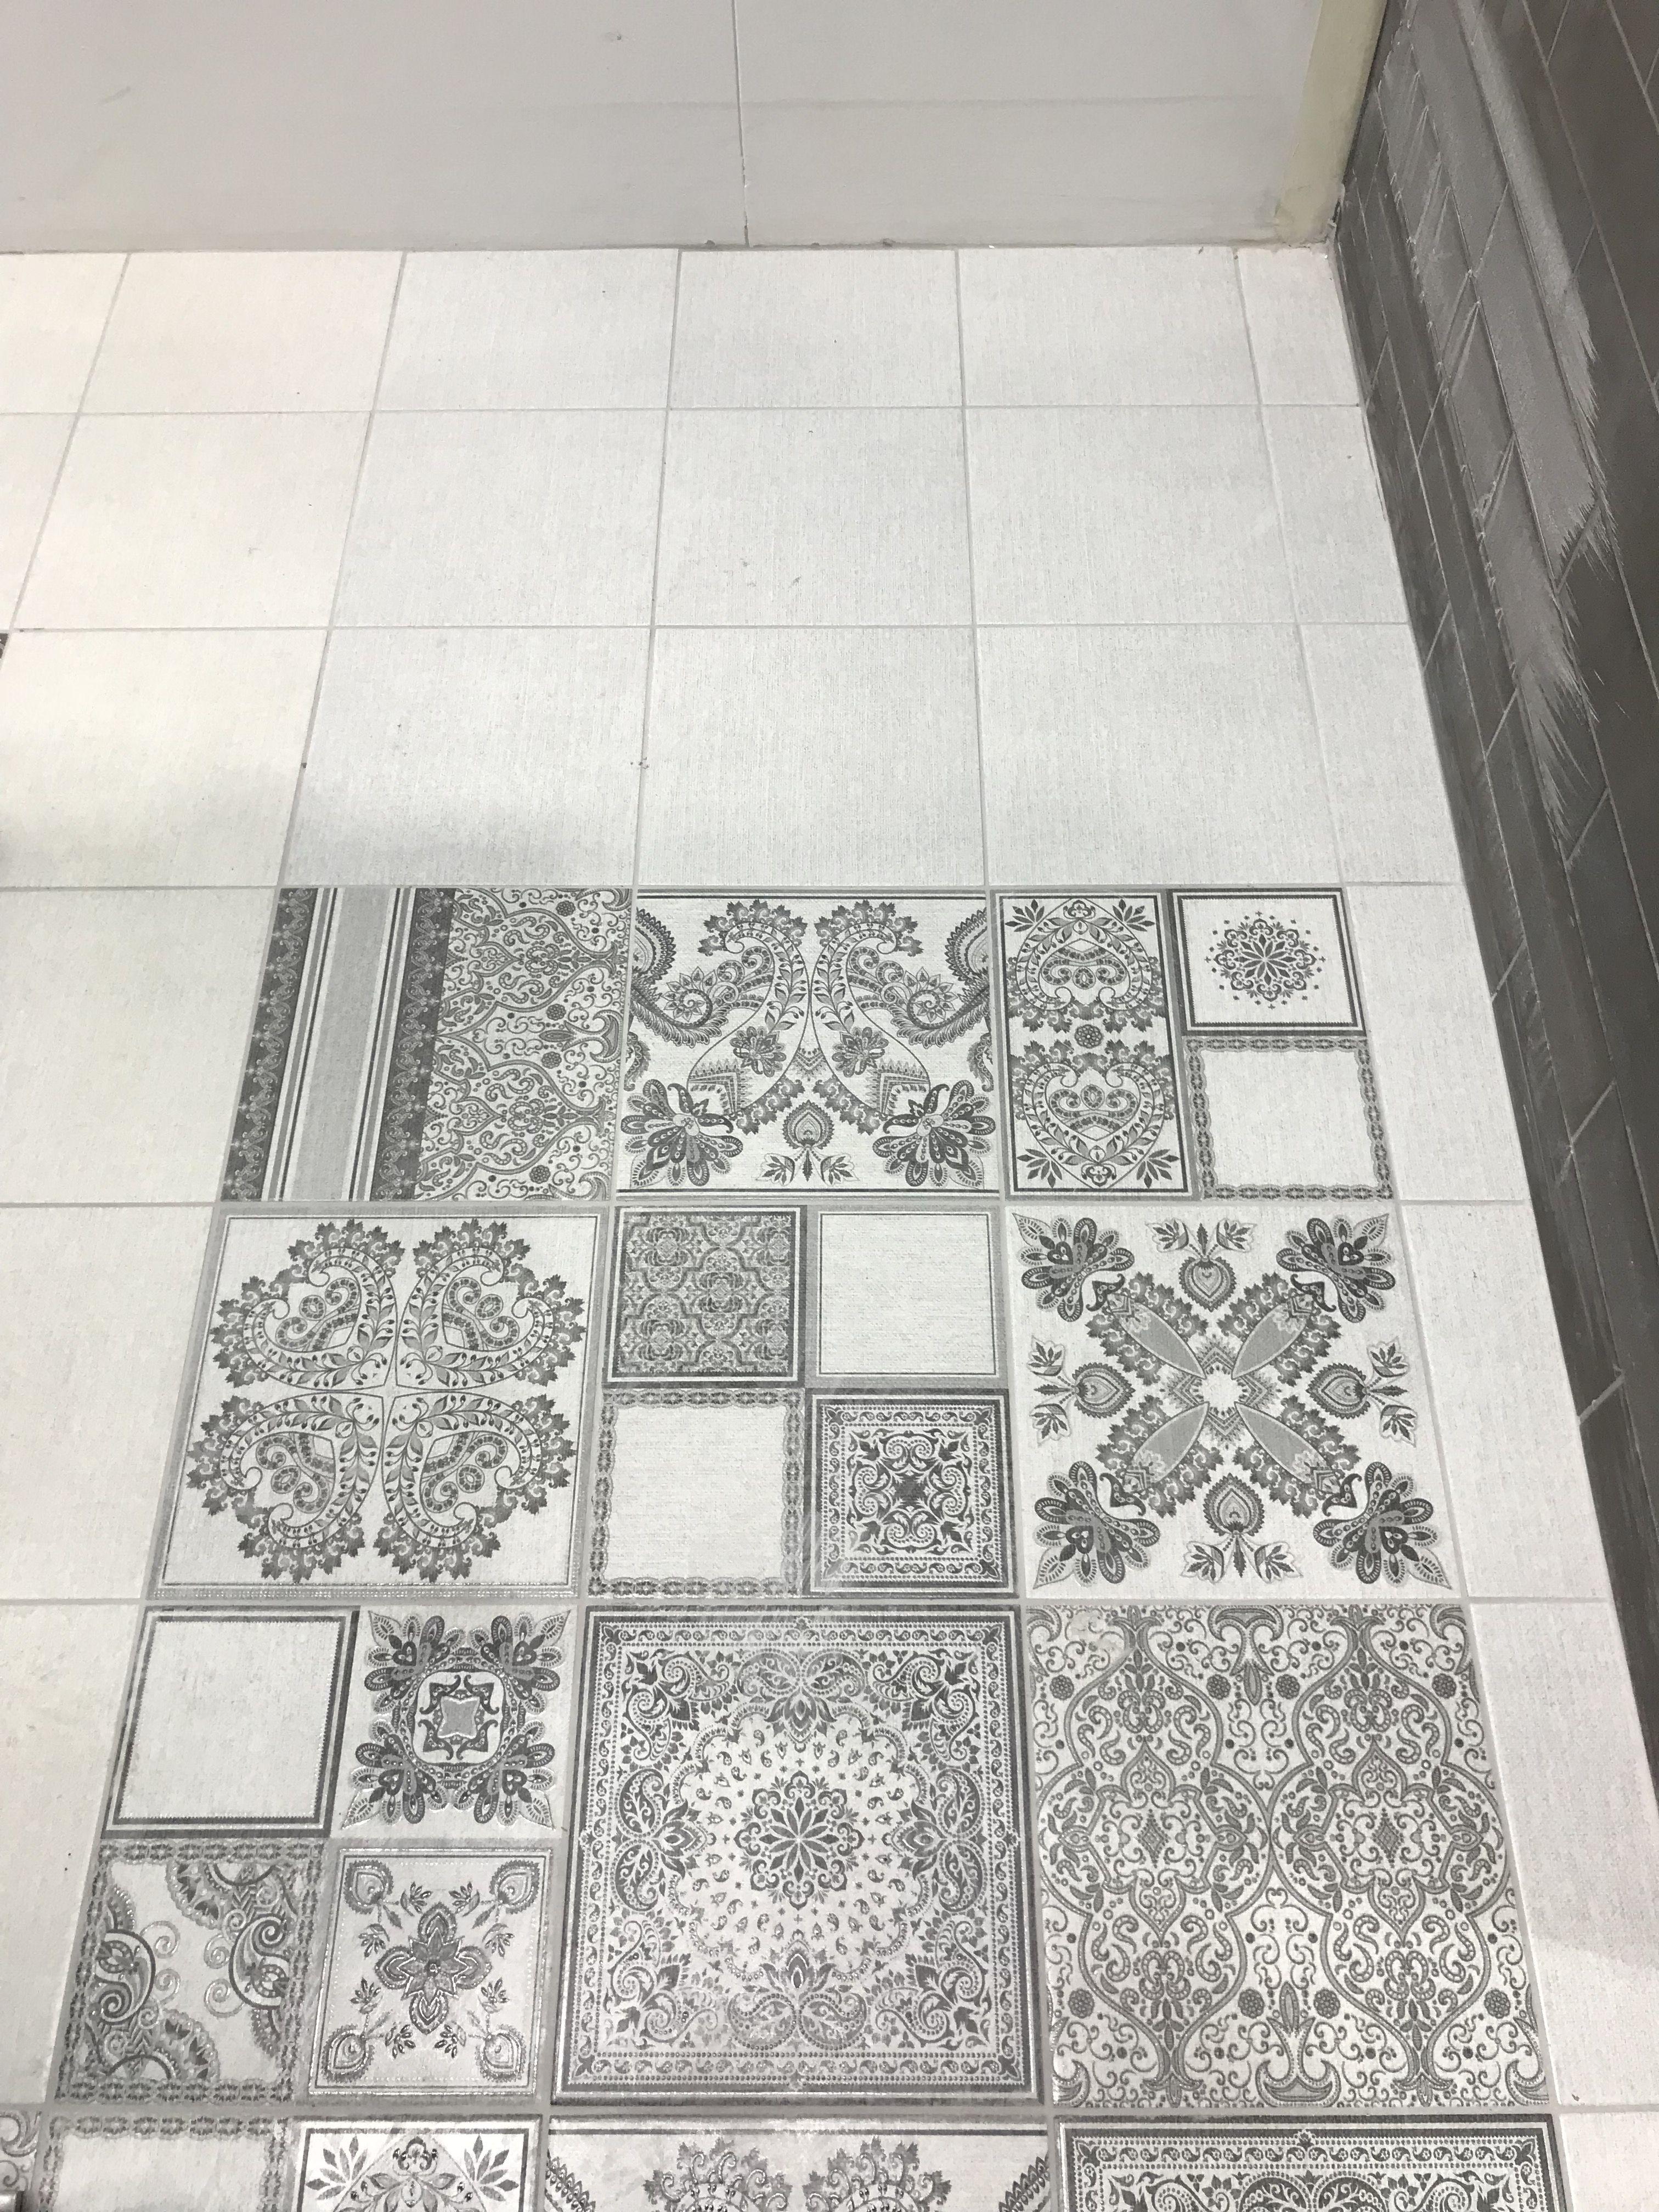 Cuadrado Persian Carpet Grey 23 5 X 23 5 Cm Bouquetceramic Bricktiles Metrotiles Porcelaintiles Porcelain White Ran Azulejos Interiores Design Cuadros